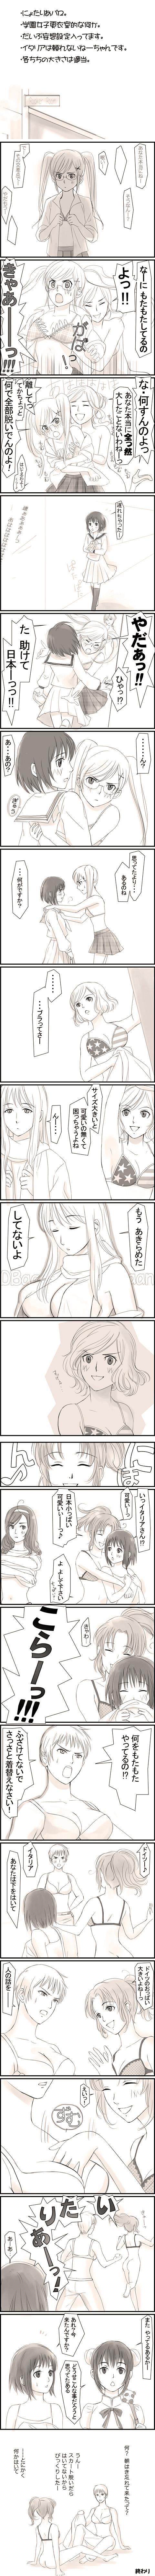 Tags: Anime, Erico Lotus, Axis Powers: Hetalia, Japan (Female), United States (Female), North Italy, Russia (Female), China (Female), Russia, United Kingdom (Female), Germany (Female), United Kingdom, South Italy (Female)